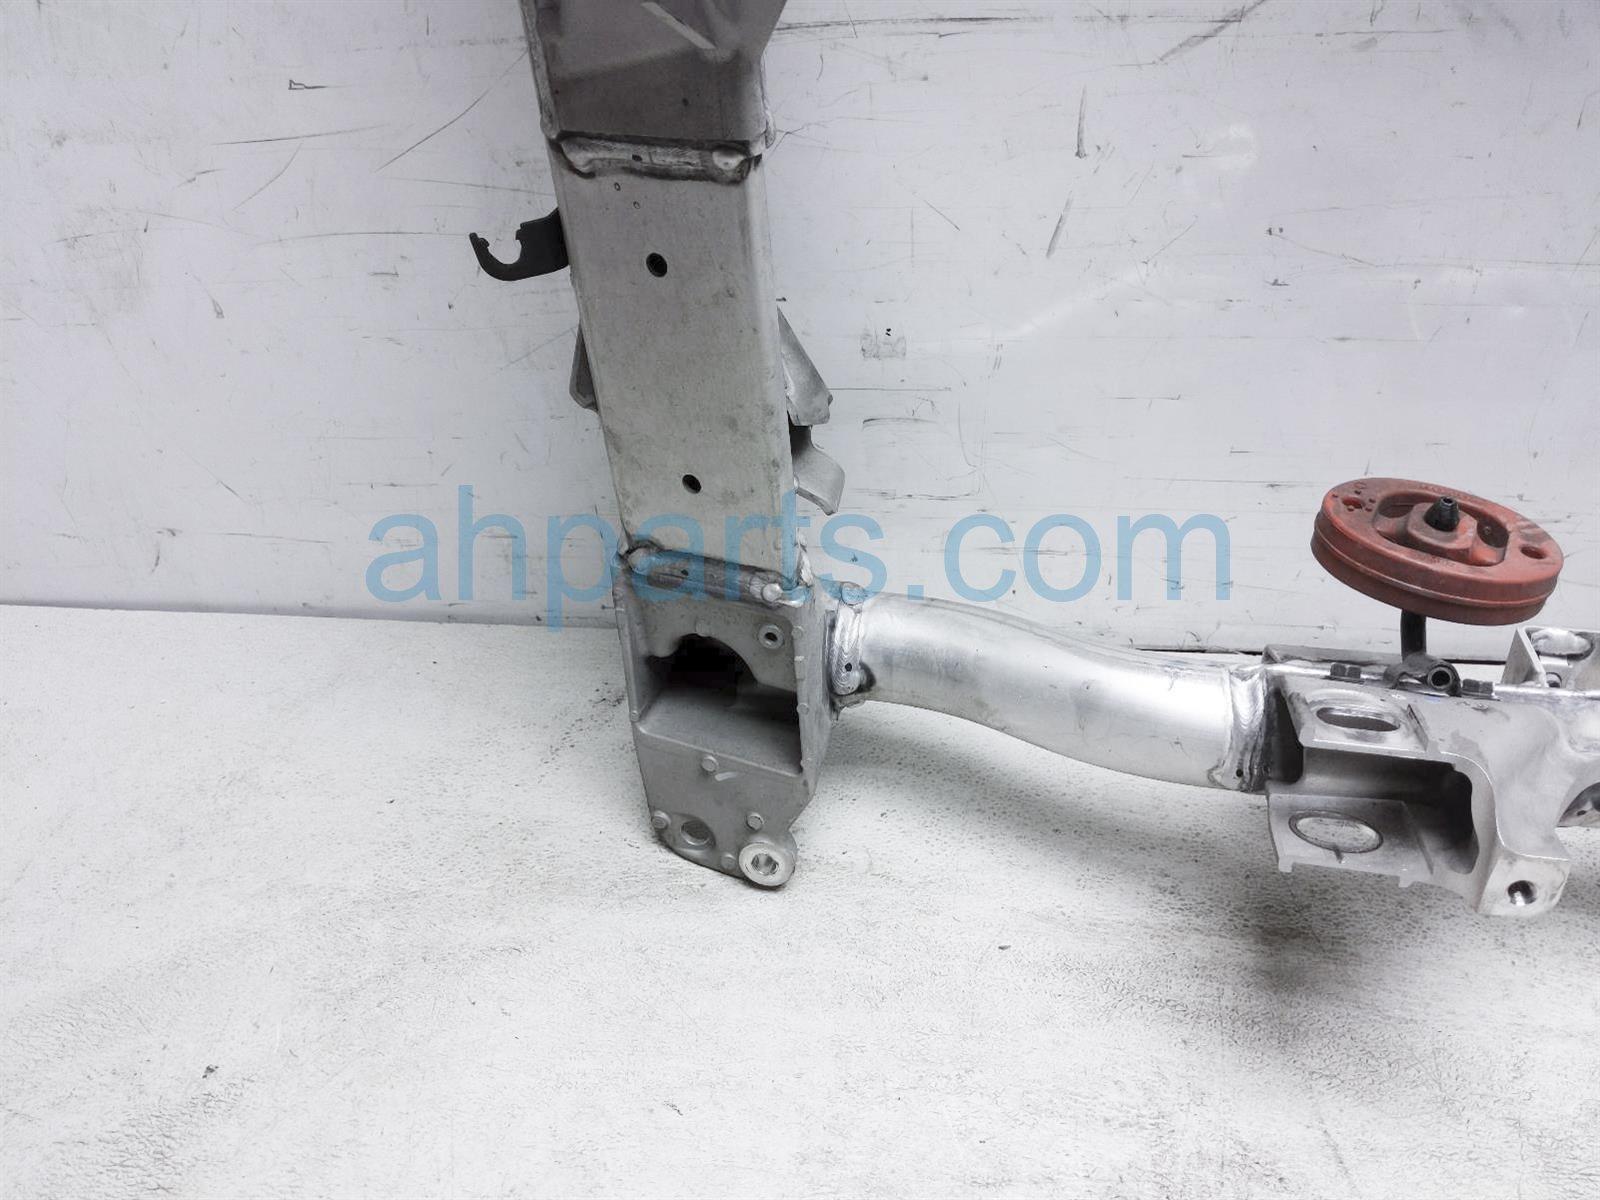 2018 Honda Clarity Crossmember Rear Sub Frame / Cradle 50300 TRW A02 Replacement